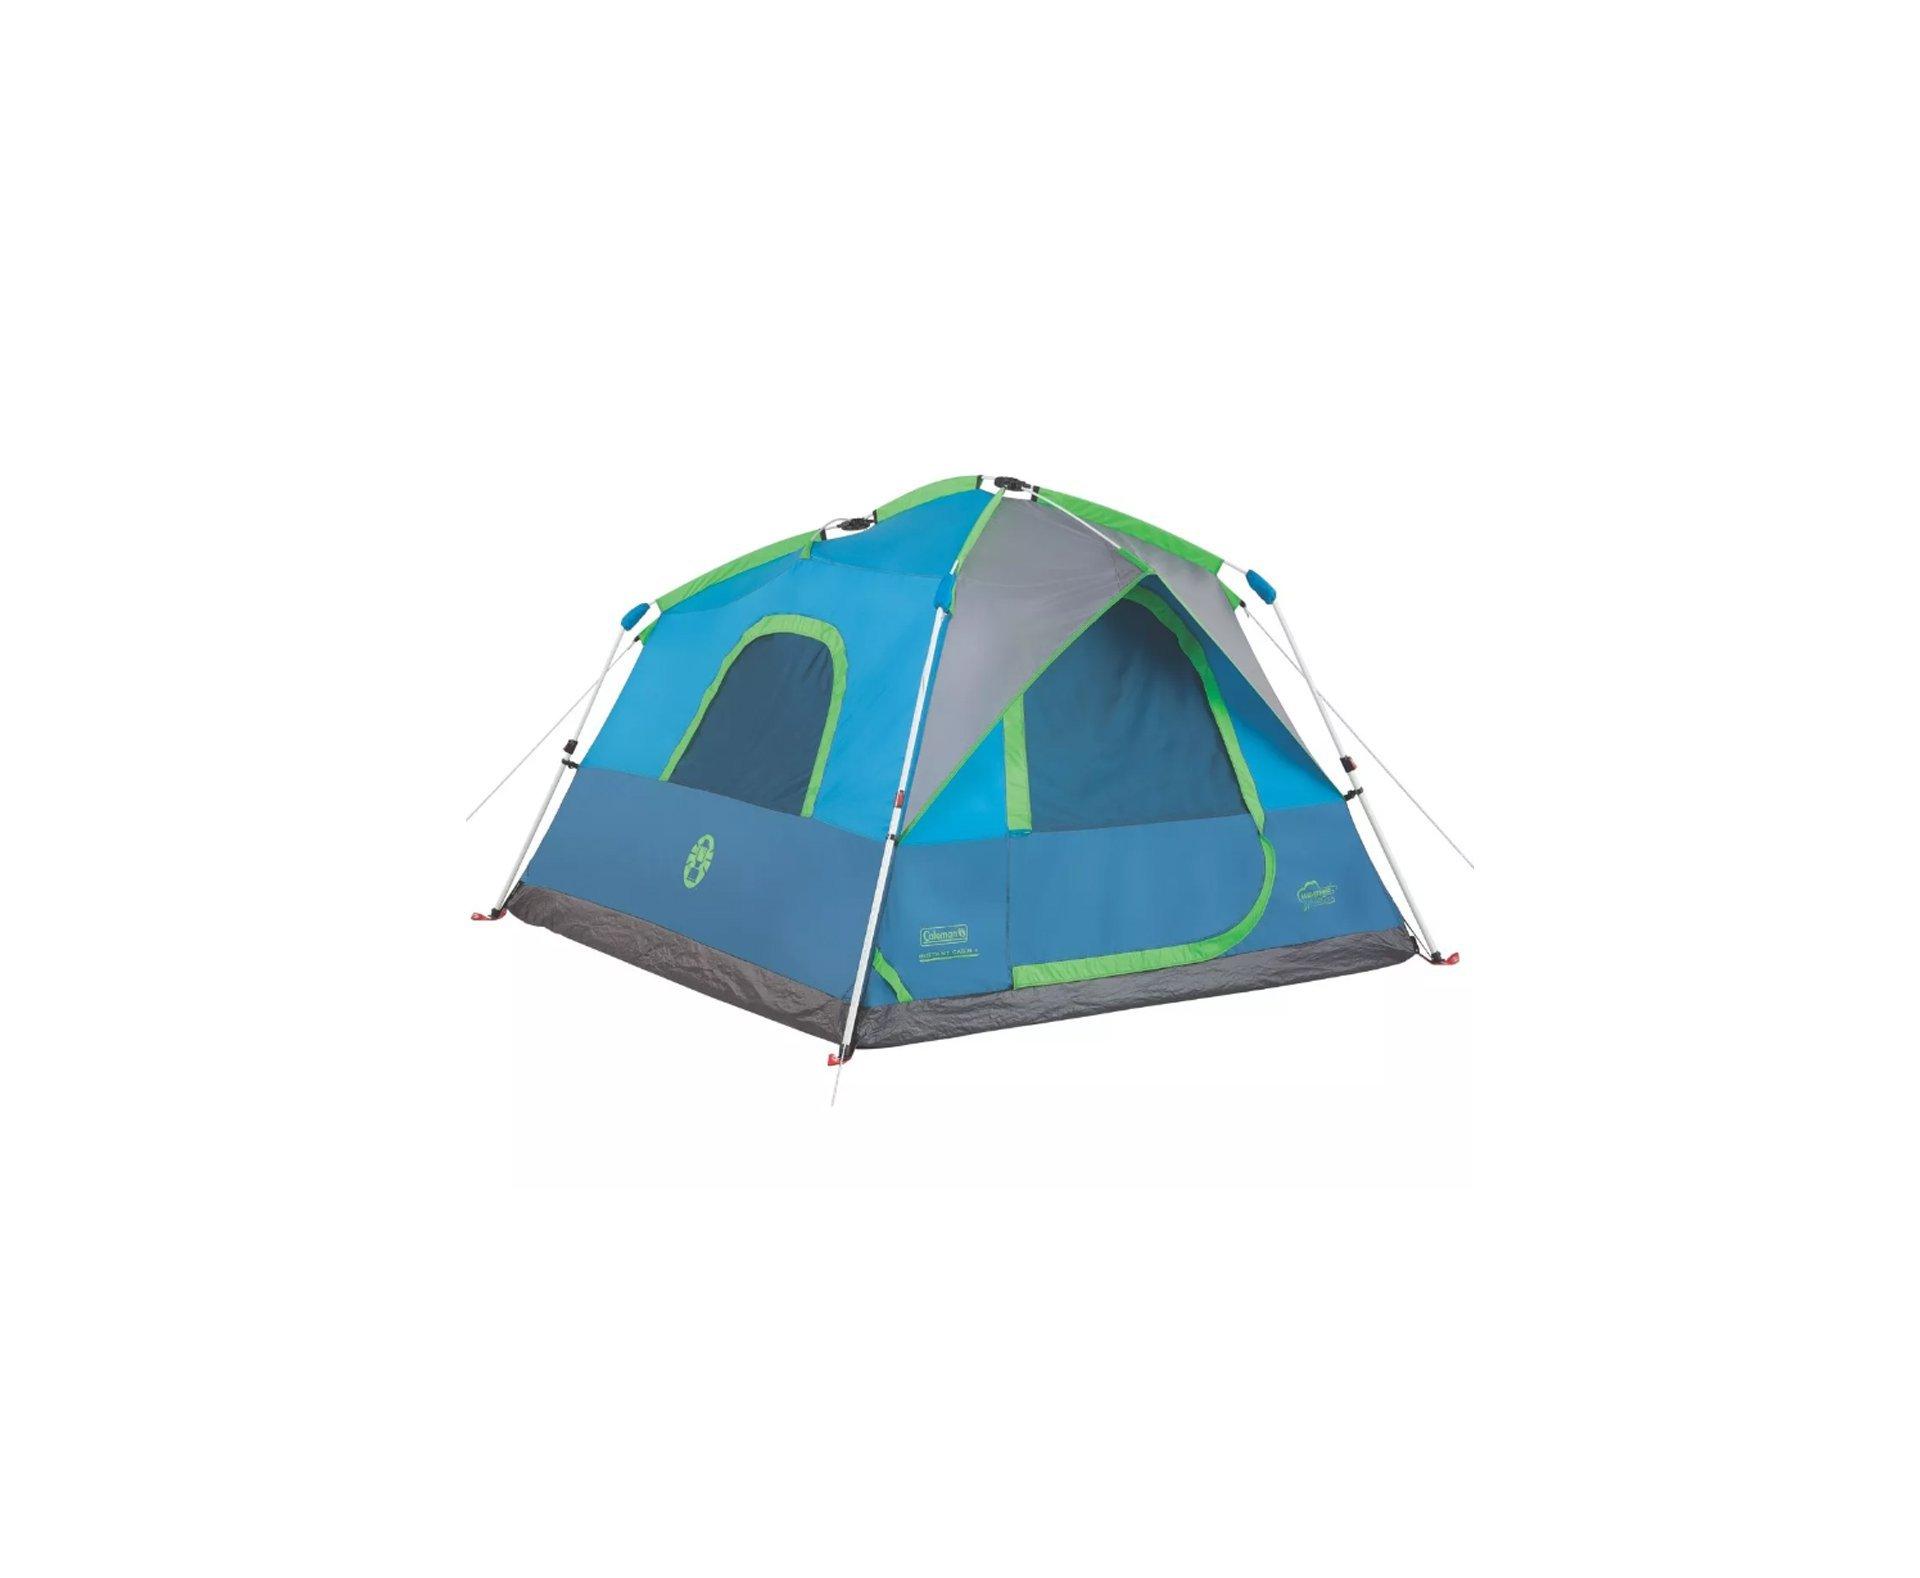 Barraca Signal Mountain Instant Tent Cabin 6 Pessoas 2000mm Coluna Dágua - Coleman